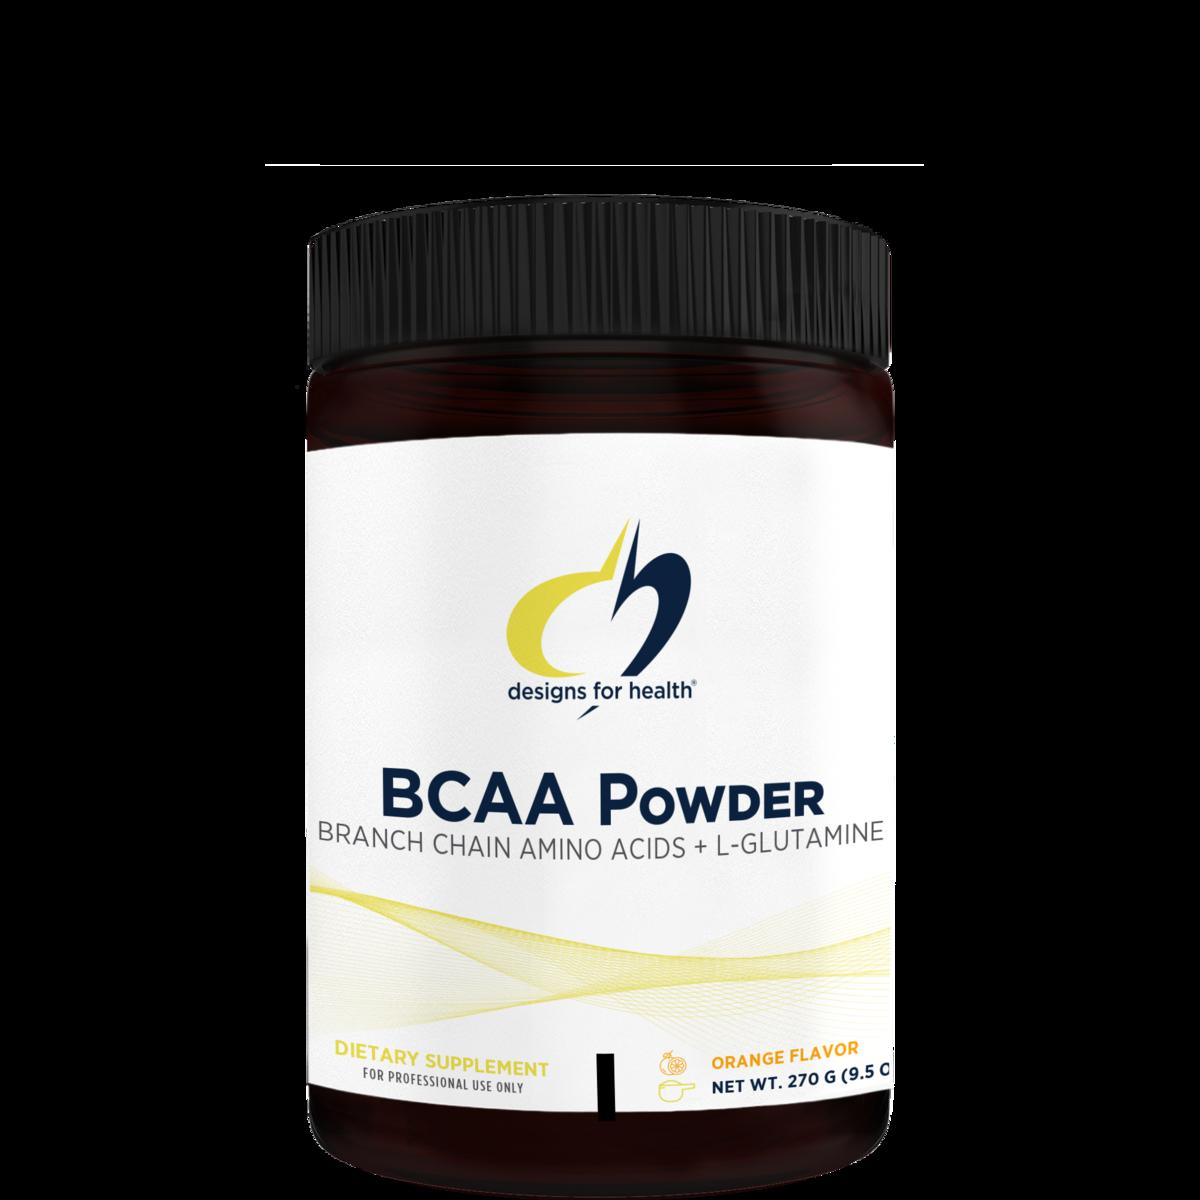 Bcaa-powder-with-l-glutamine_270g9.5ozpowder-1